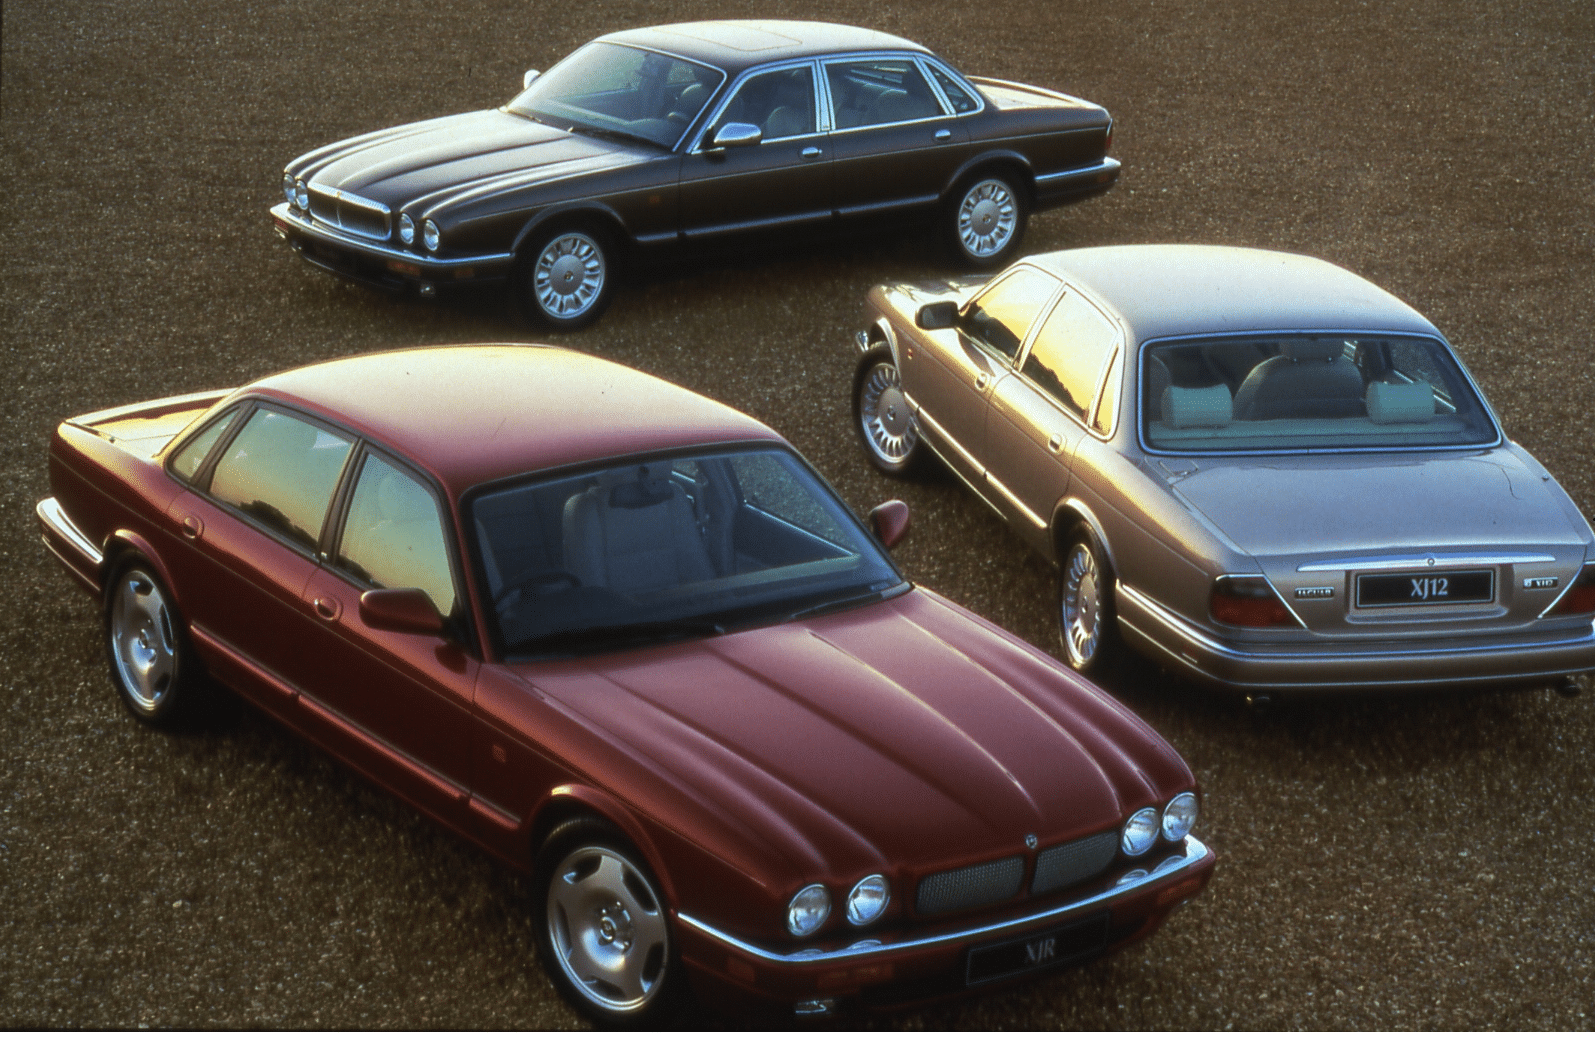 Jaguar XJ, Jaguar, XJ, XJ6, XJ8, XJR, V8 straight-six, british car, gaydon, classic car, retro car, daimler, motoring, automotive, car, cars, british classic, gangster, snatch, ebay motors, autotrader